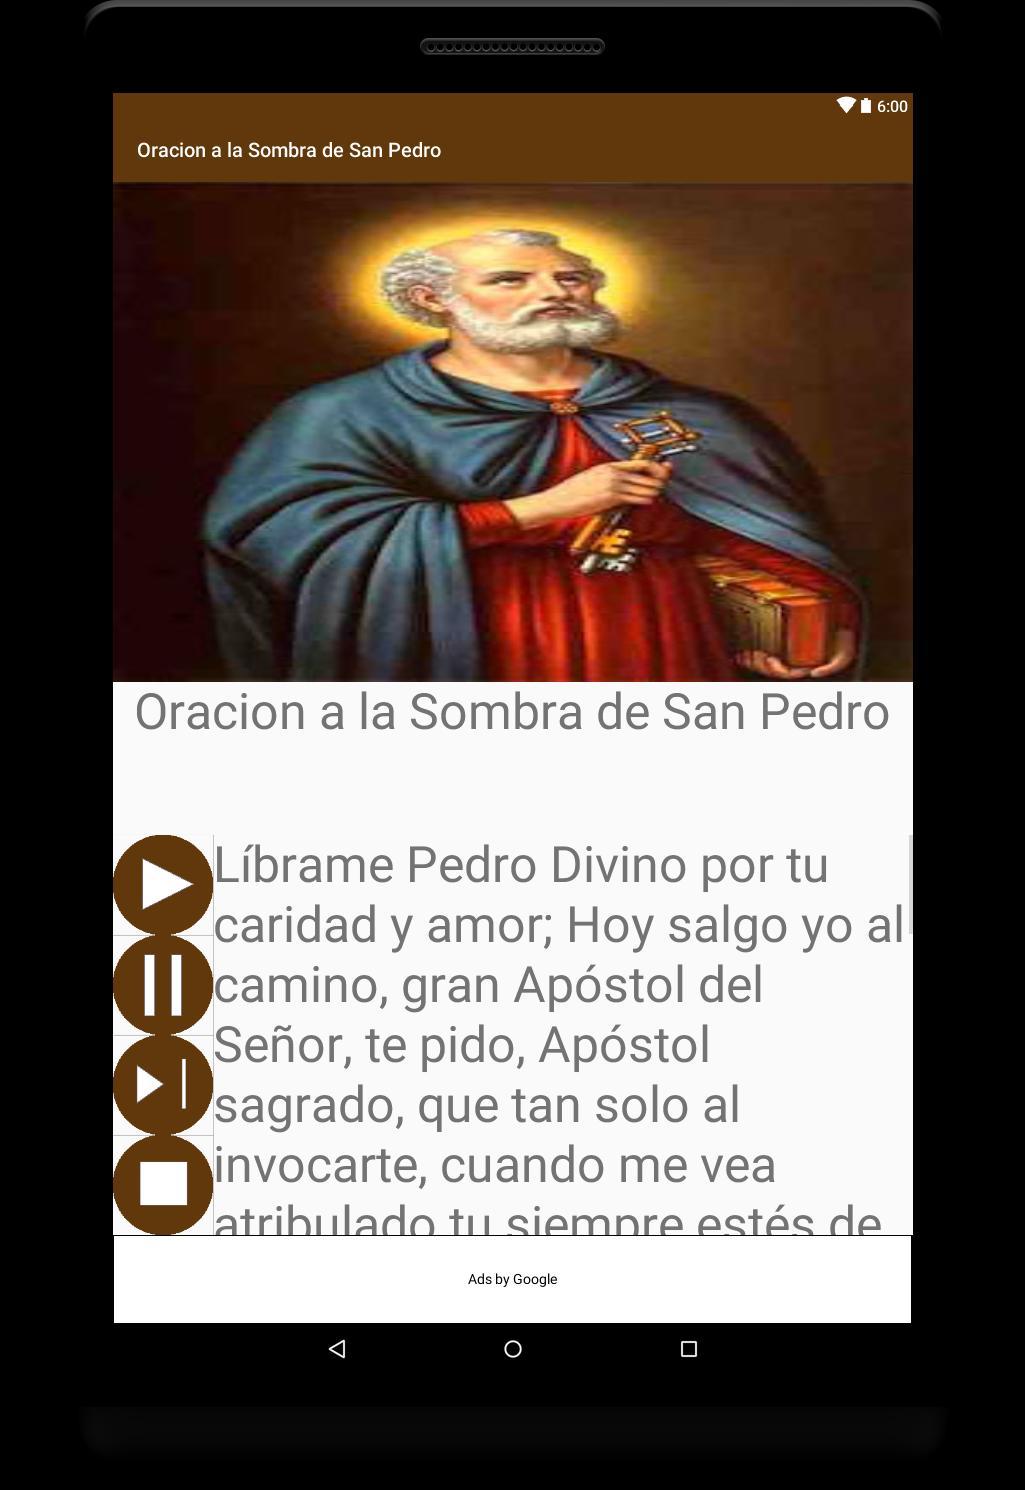 Oracion a Sombra de San Pedro for Android - APK Download